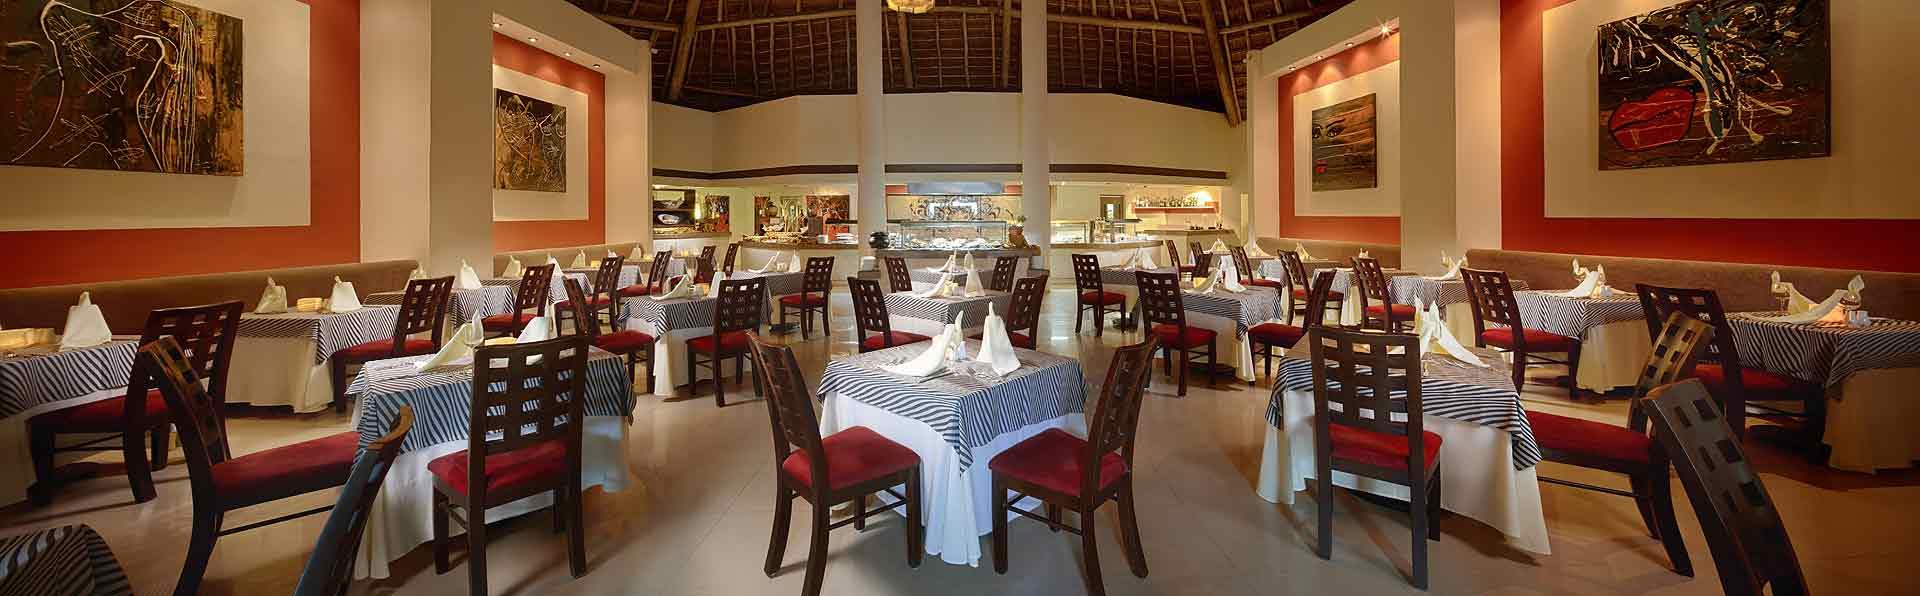 El Arrecife Buffet Restaurante